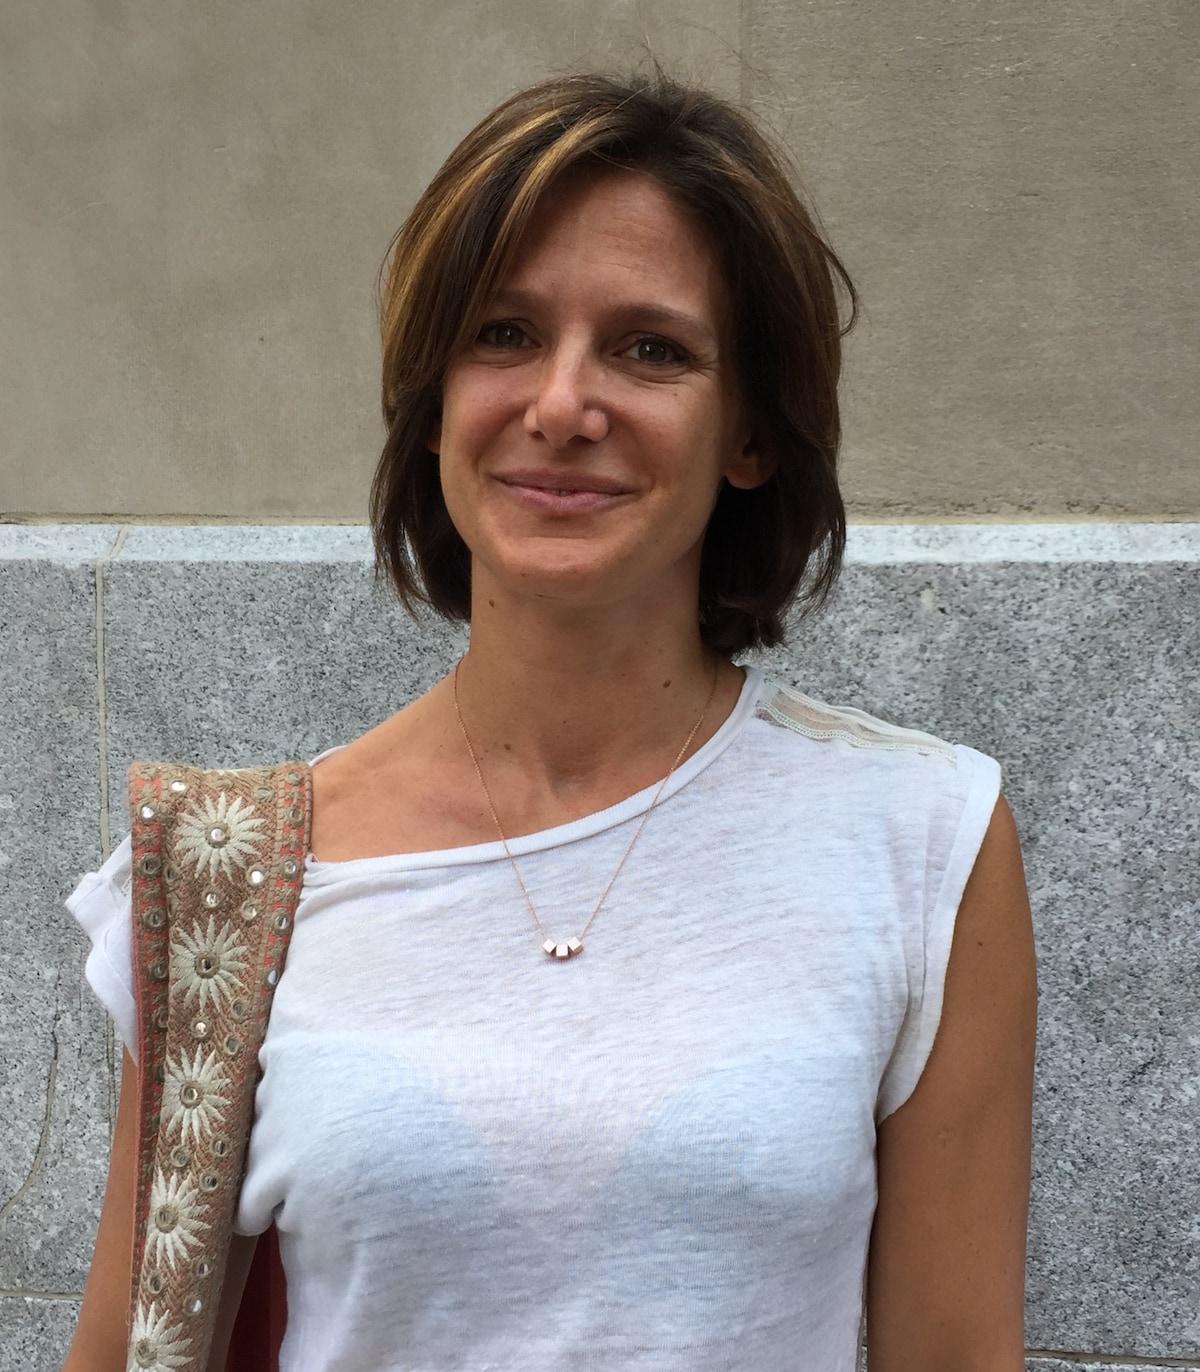 Deborah from Cannes